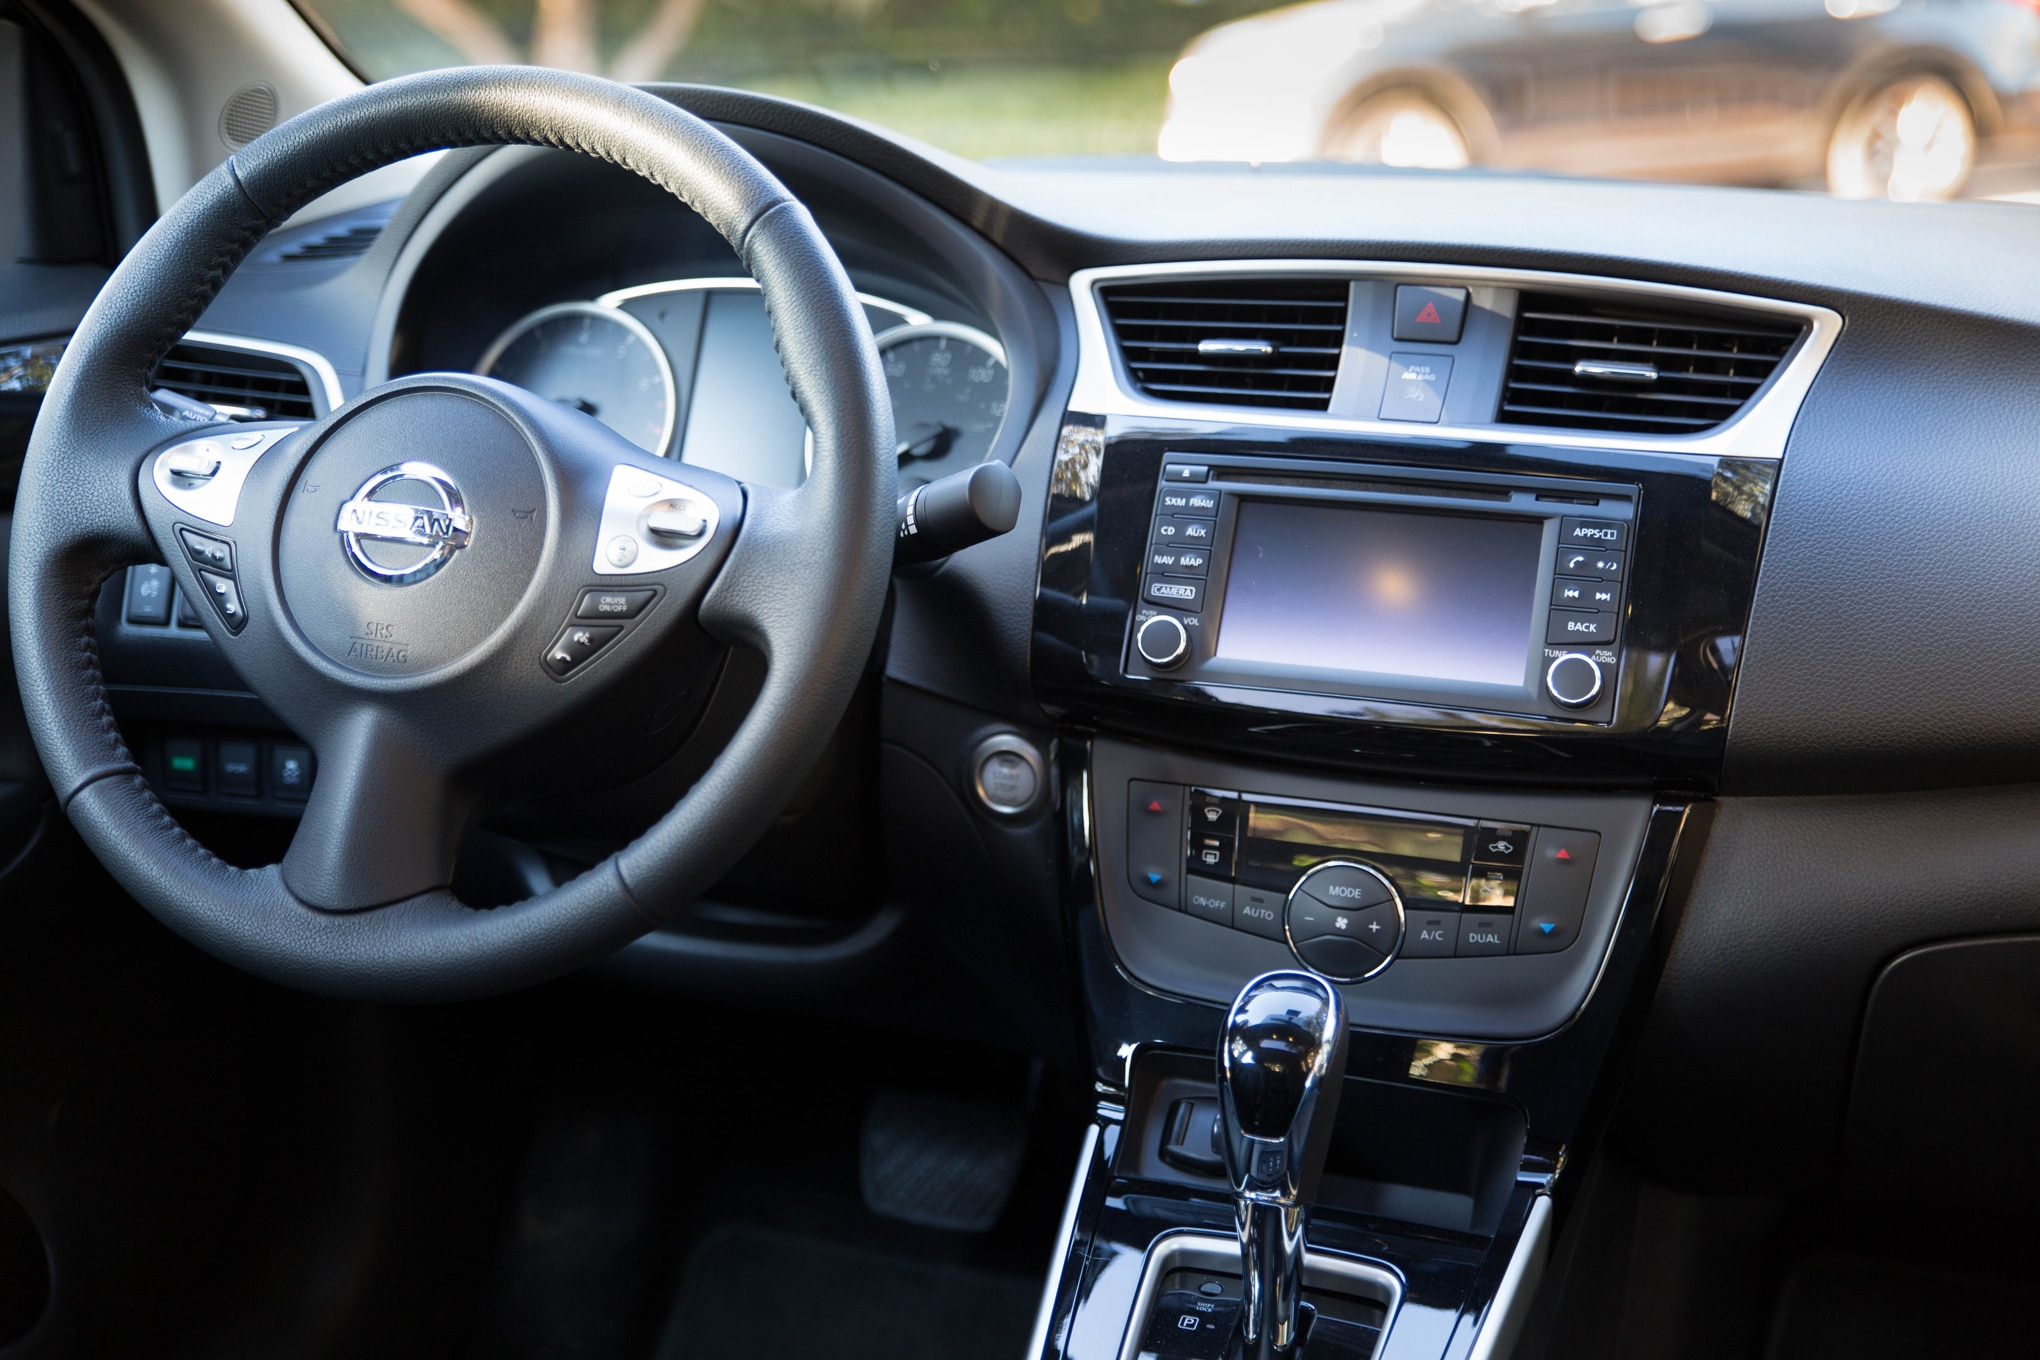 Nissan Sentra 2016 Primer Manejo